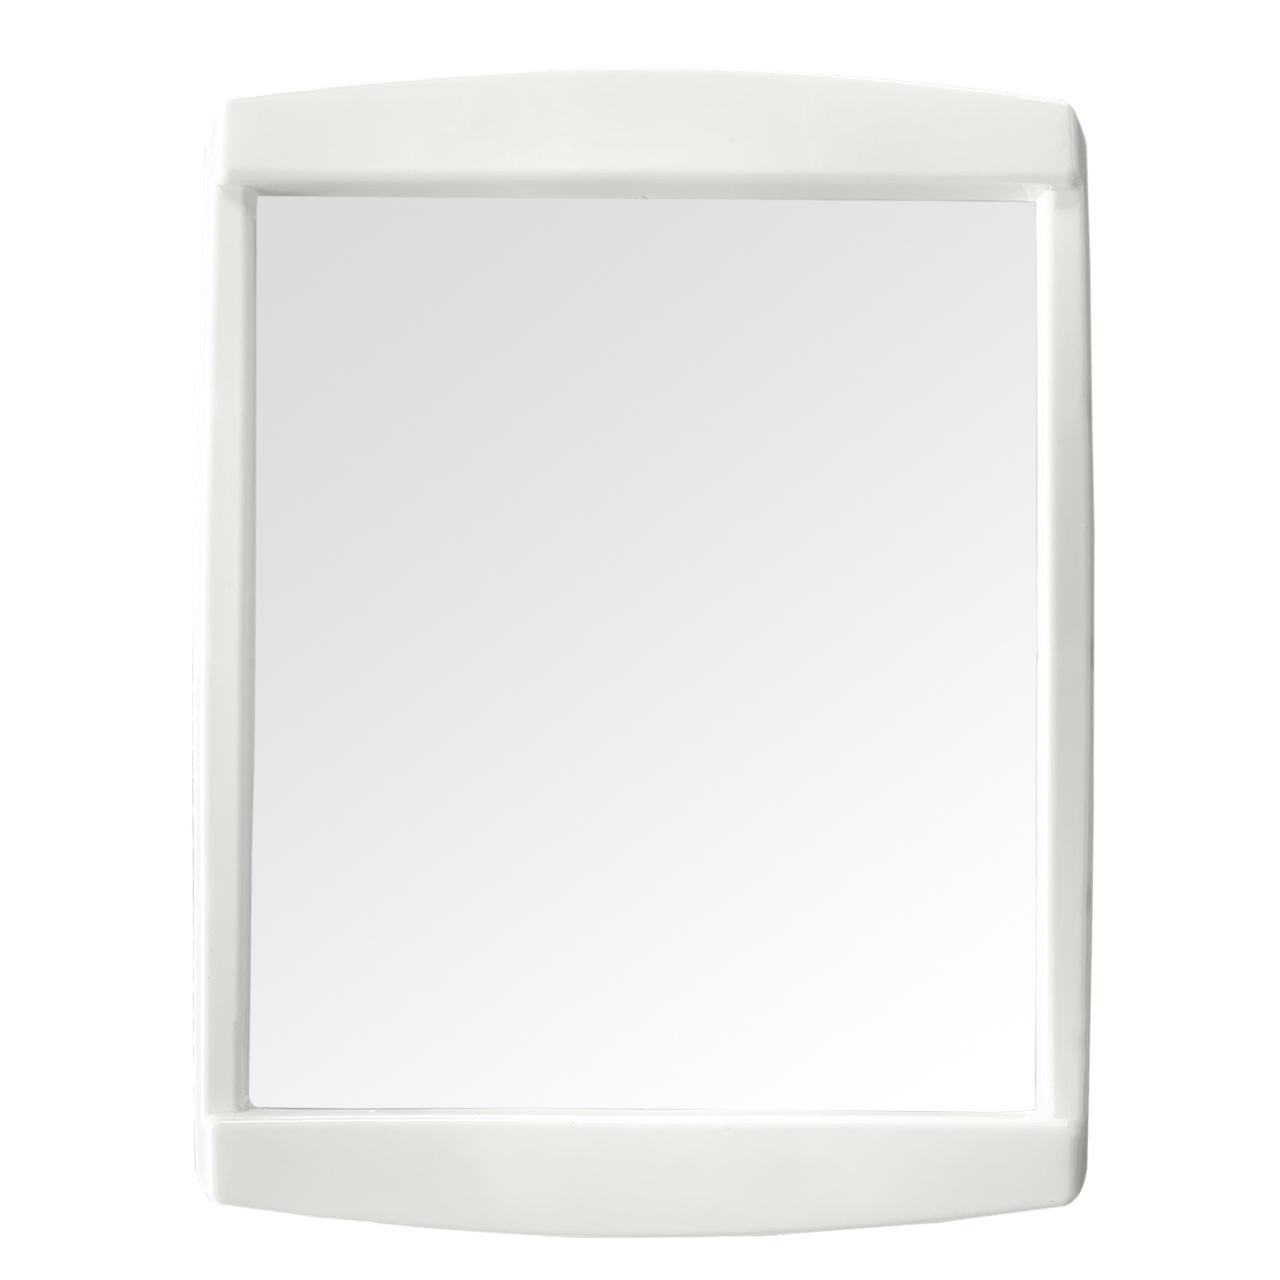 آینه الف پلاستیک مدل آرا-3